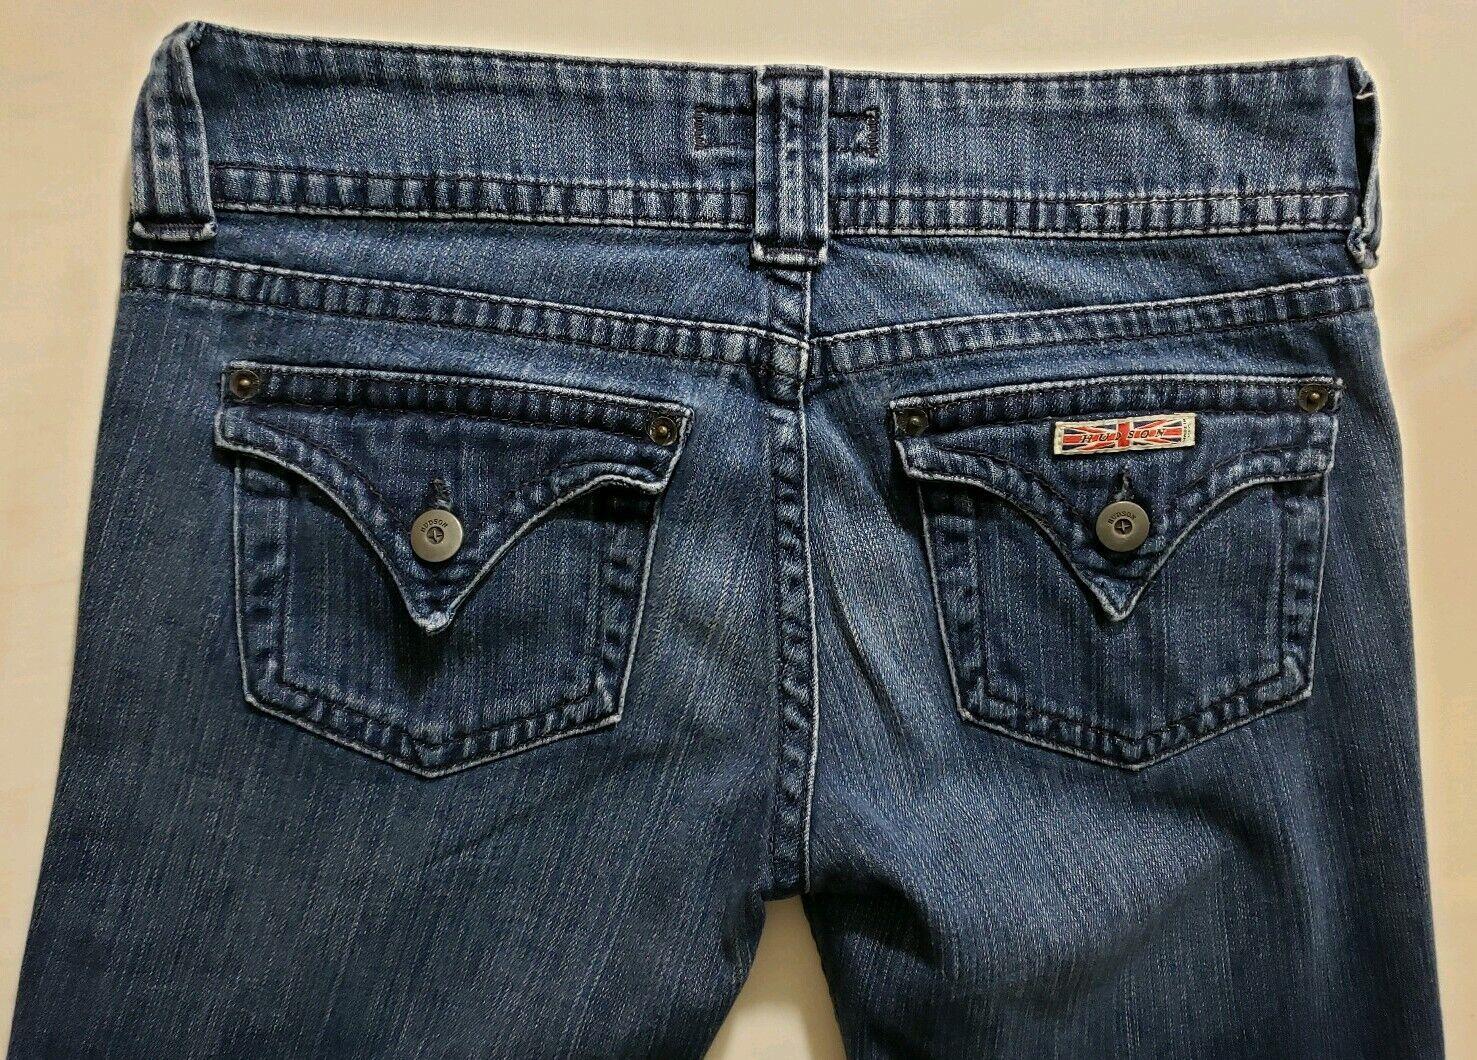 Hudson Womens Denim bluee Jeans Size 28 x 32 Boot Cut Dark Wash Low Rise Flap Poc